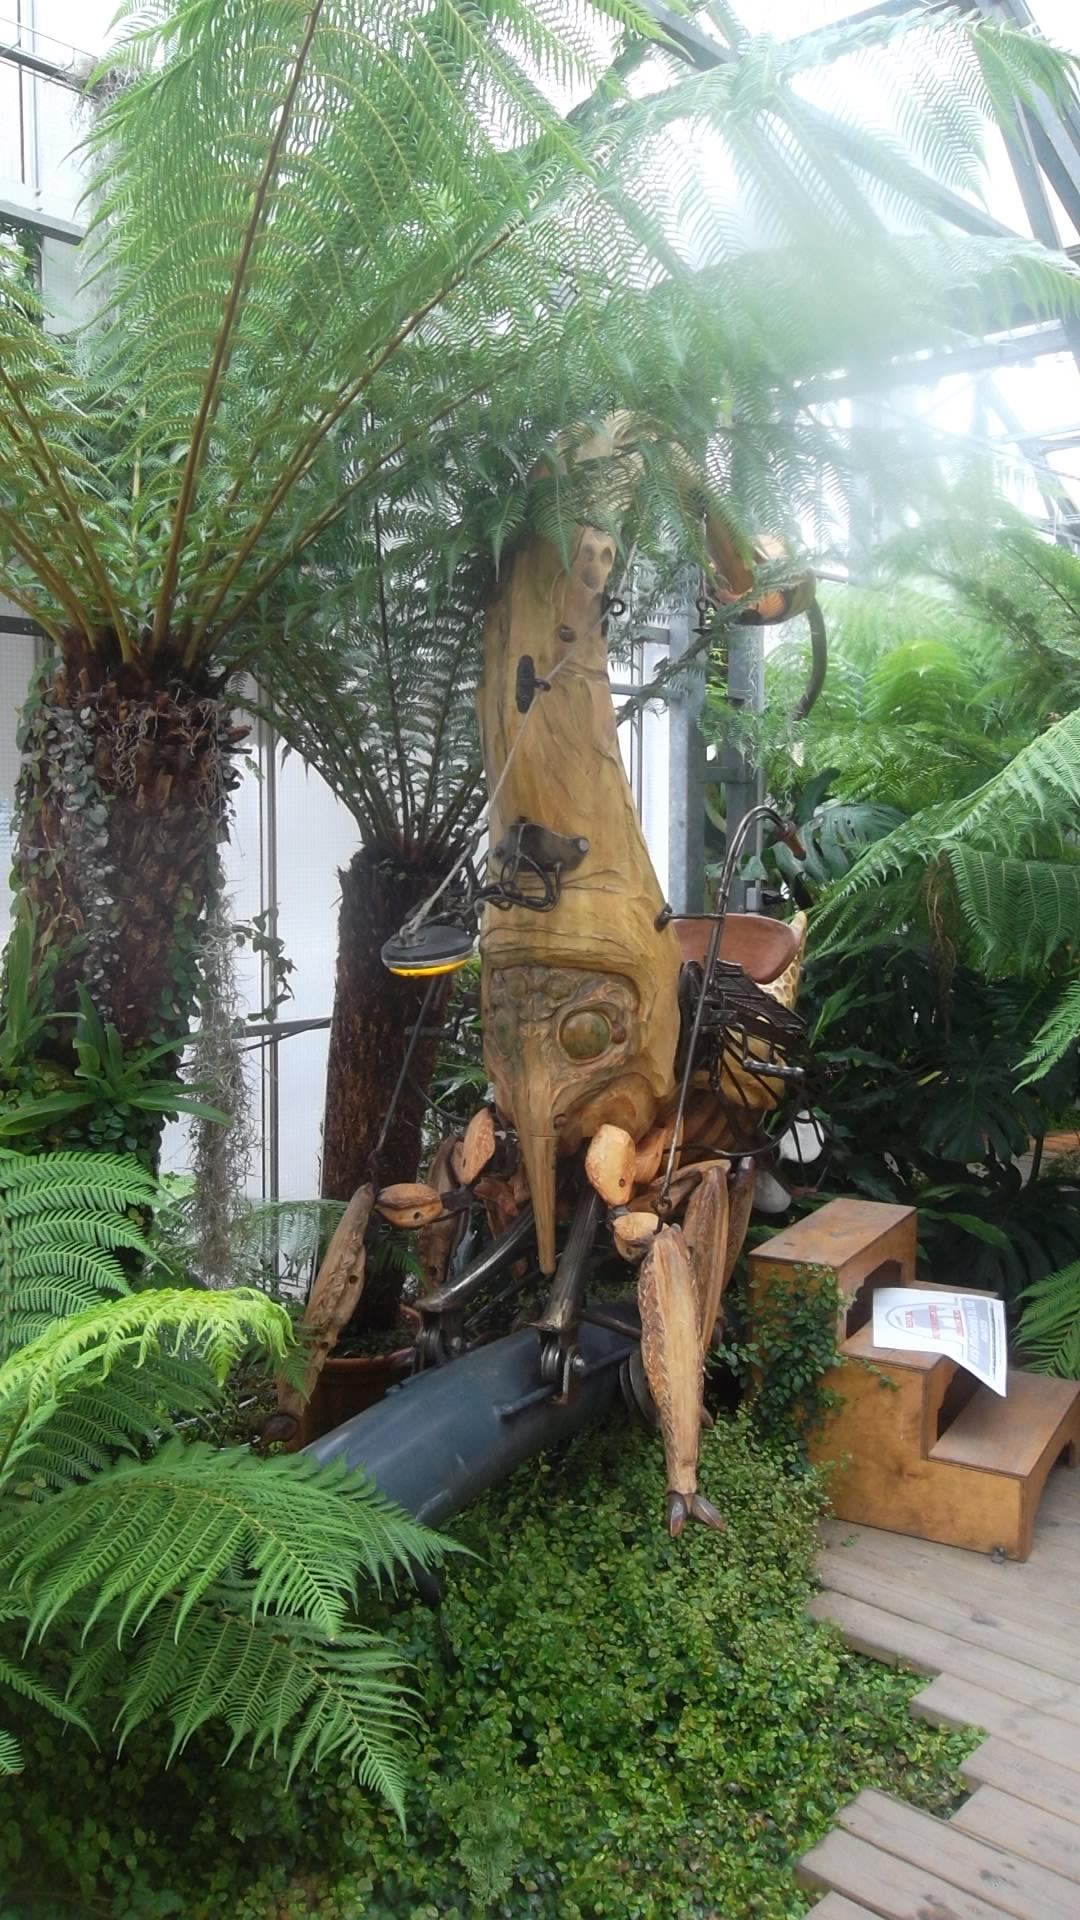 nantes-galerie-des-machines-serre-tropicale-2-my13